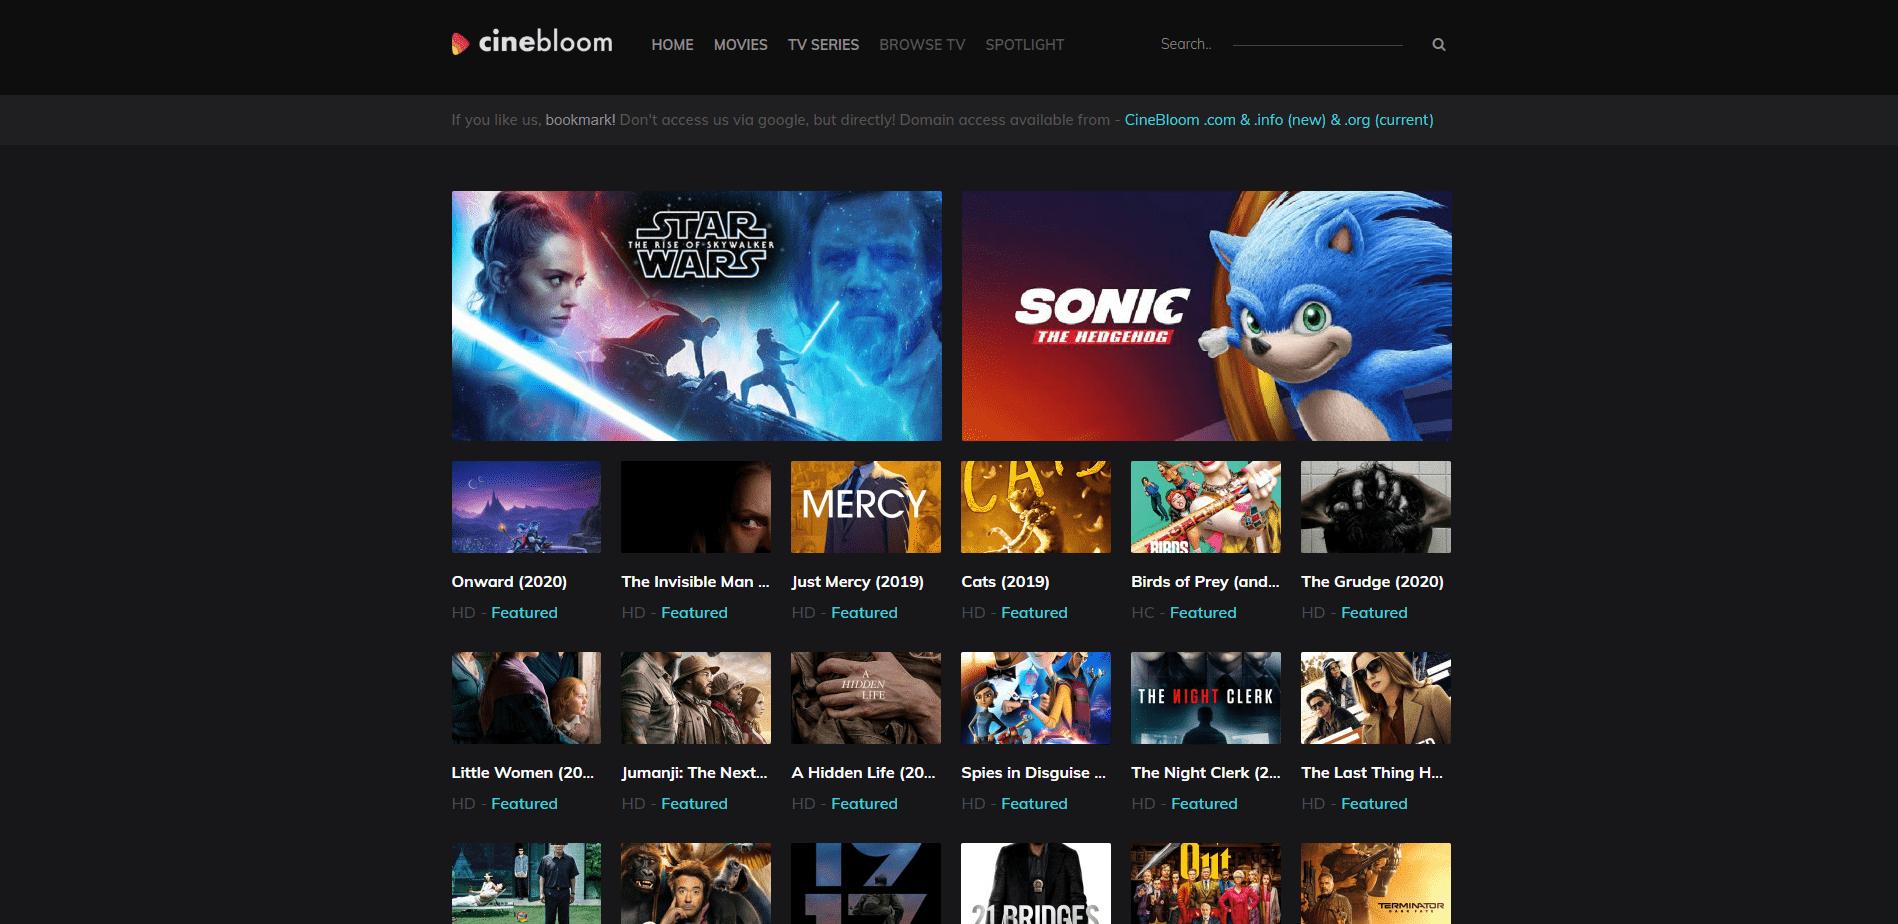 Cinebloom.org